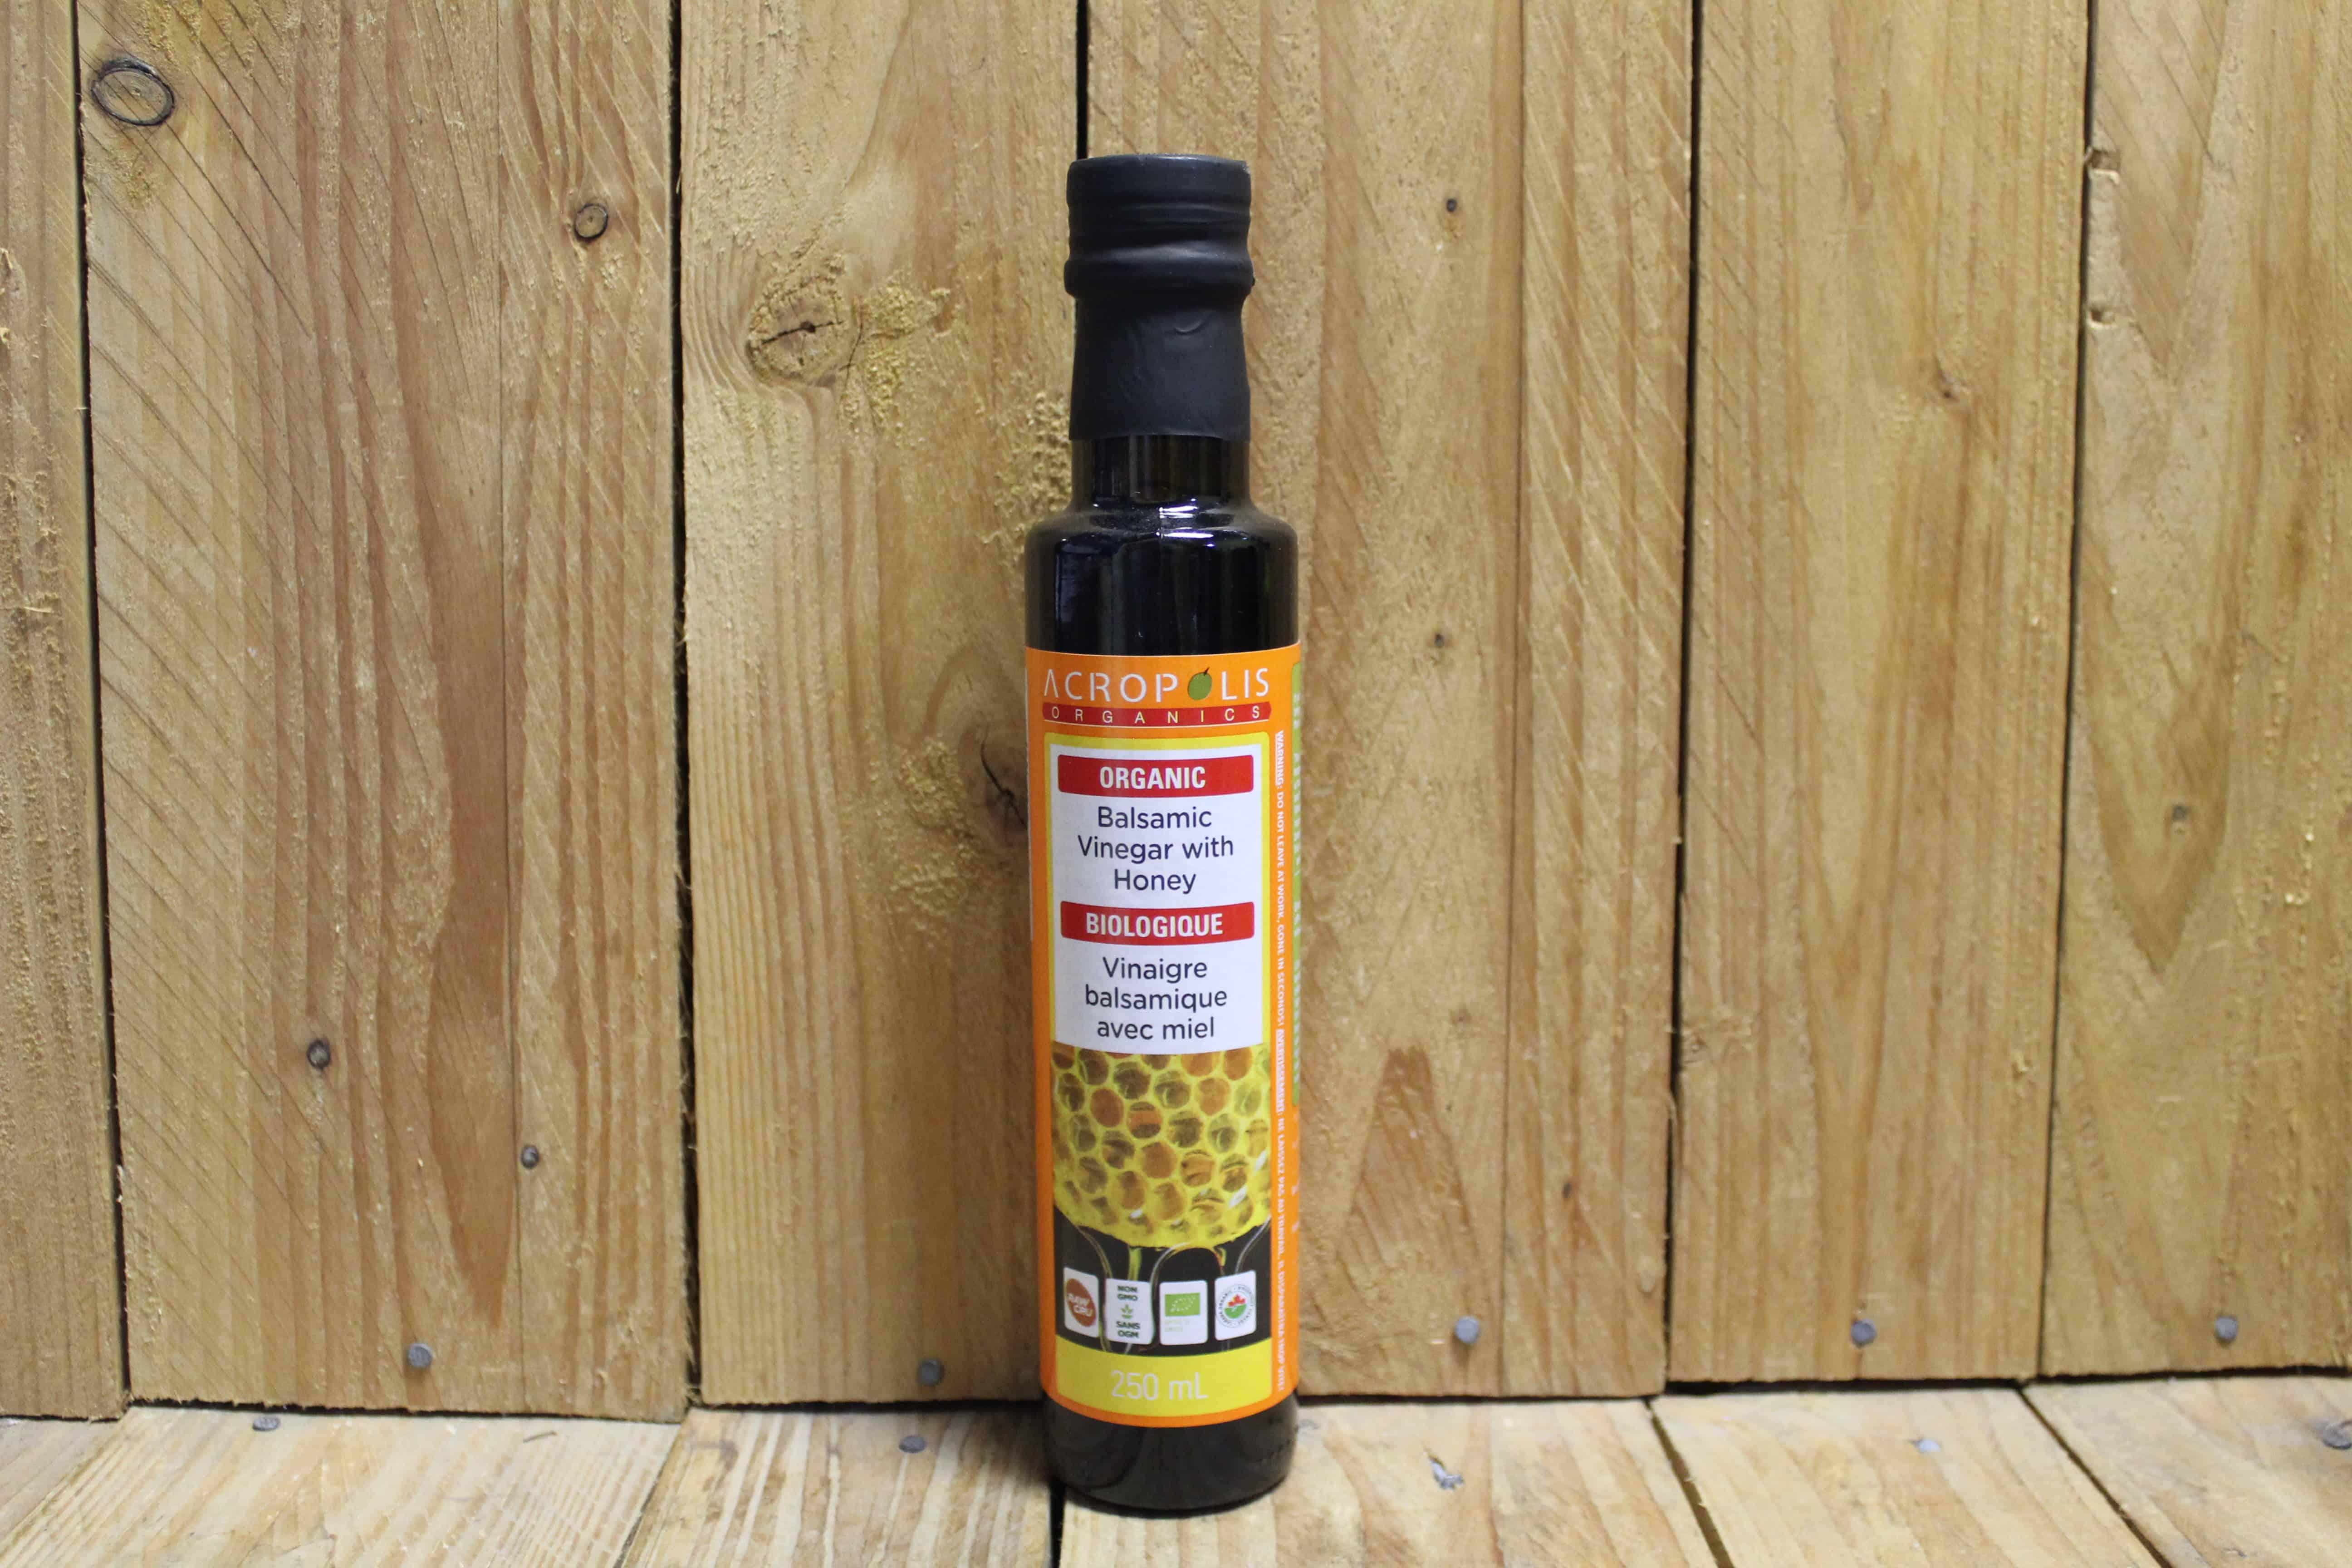 Acropolis – Organic Balsamic Vinegar with Honey (250ml)